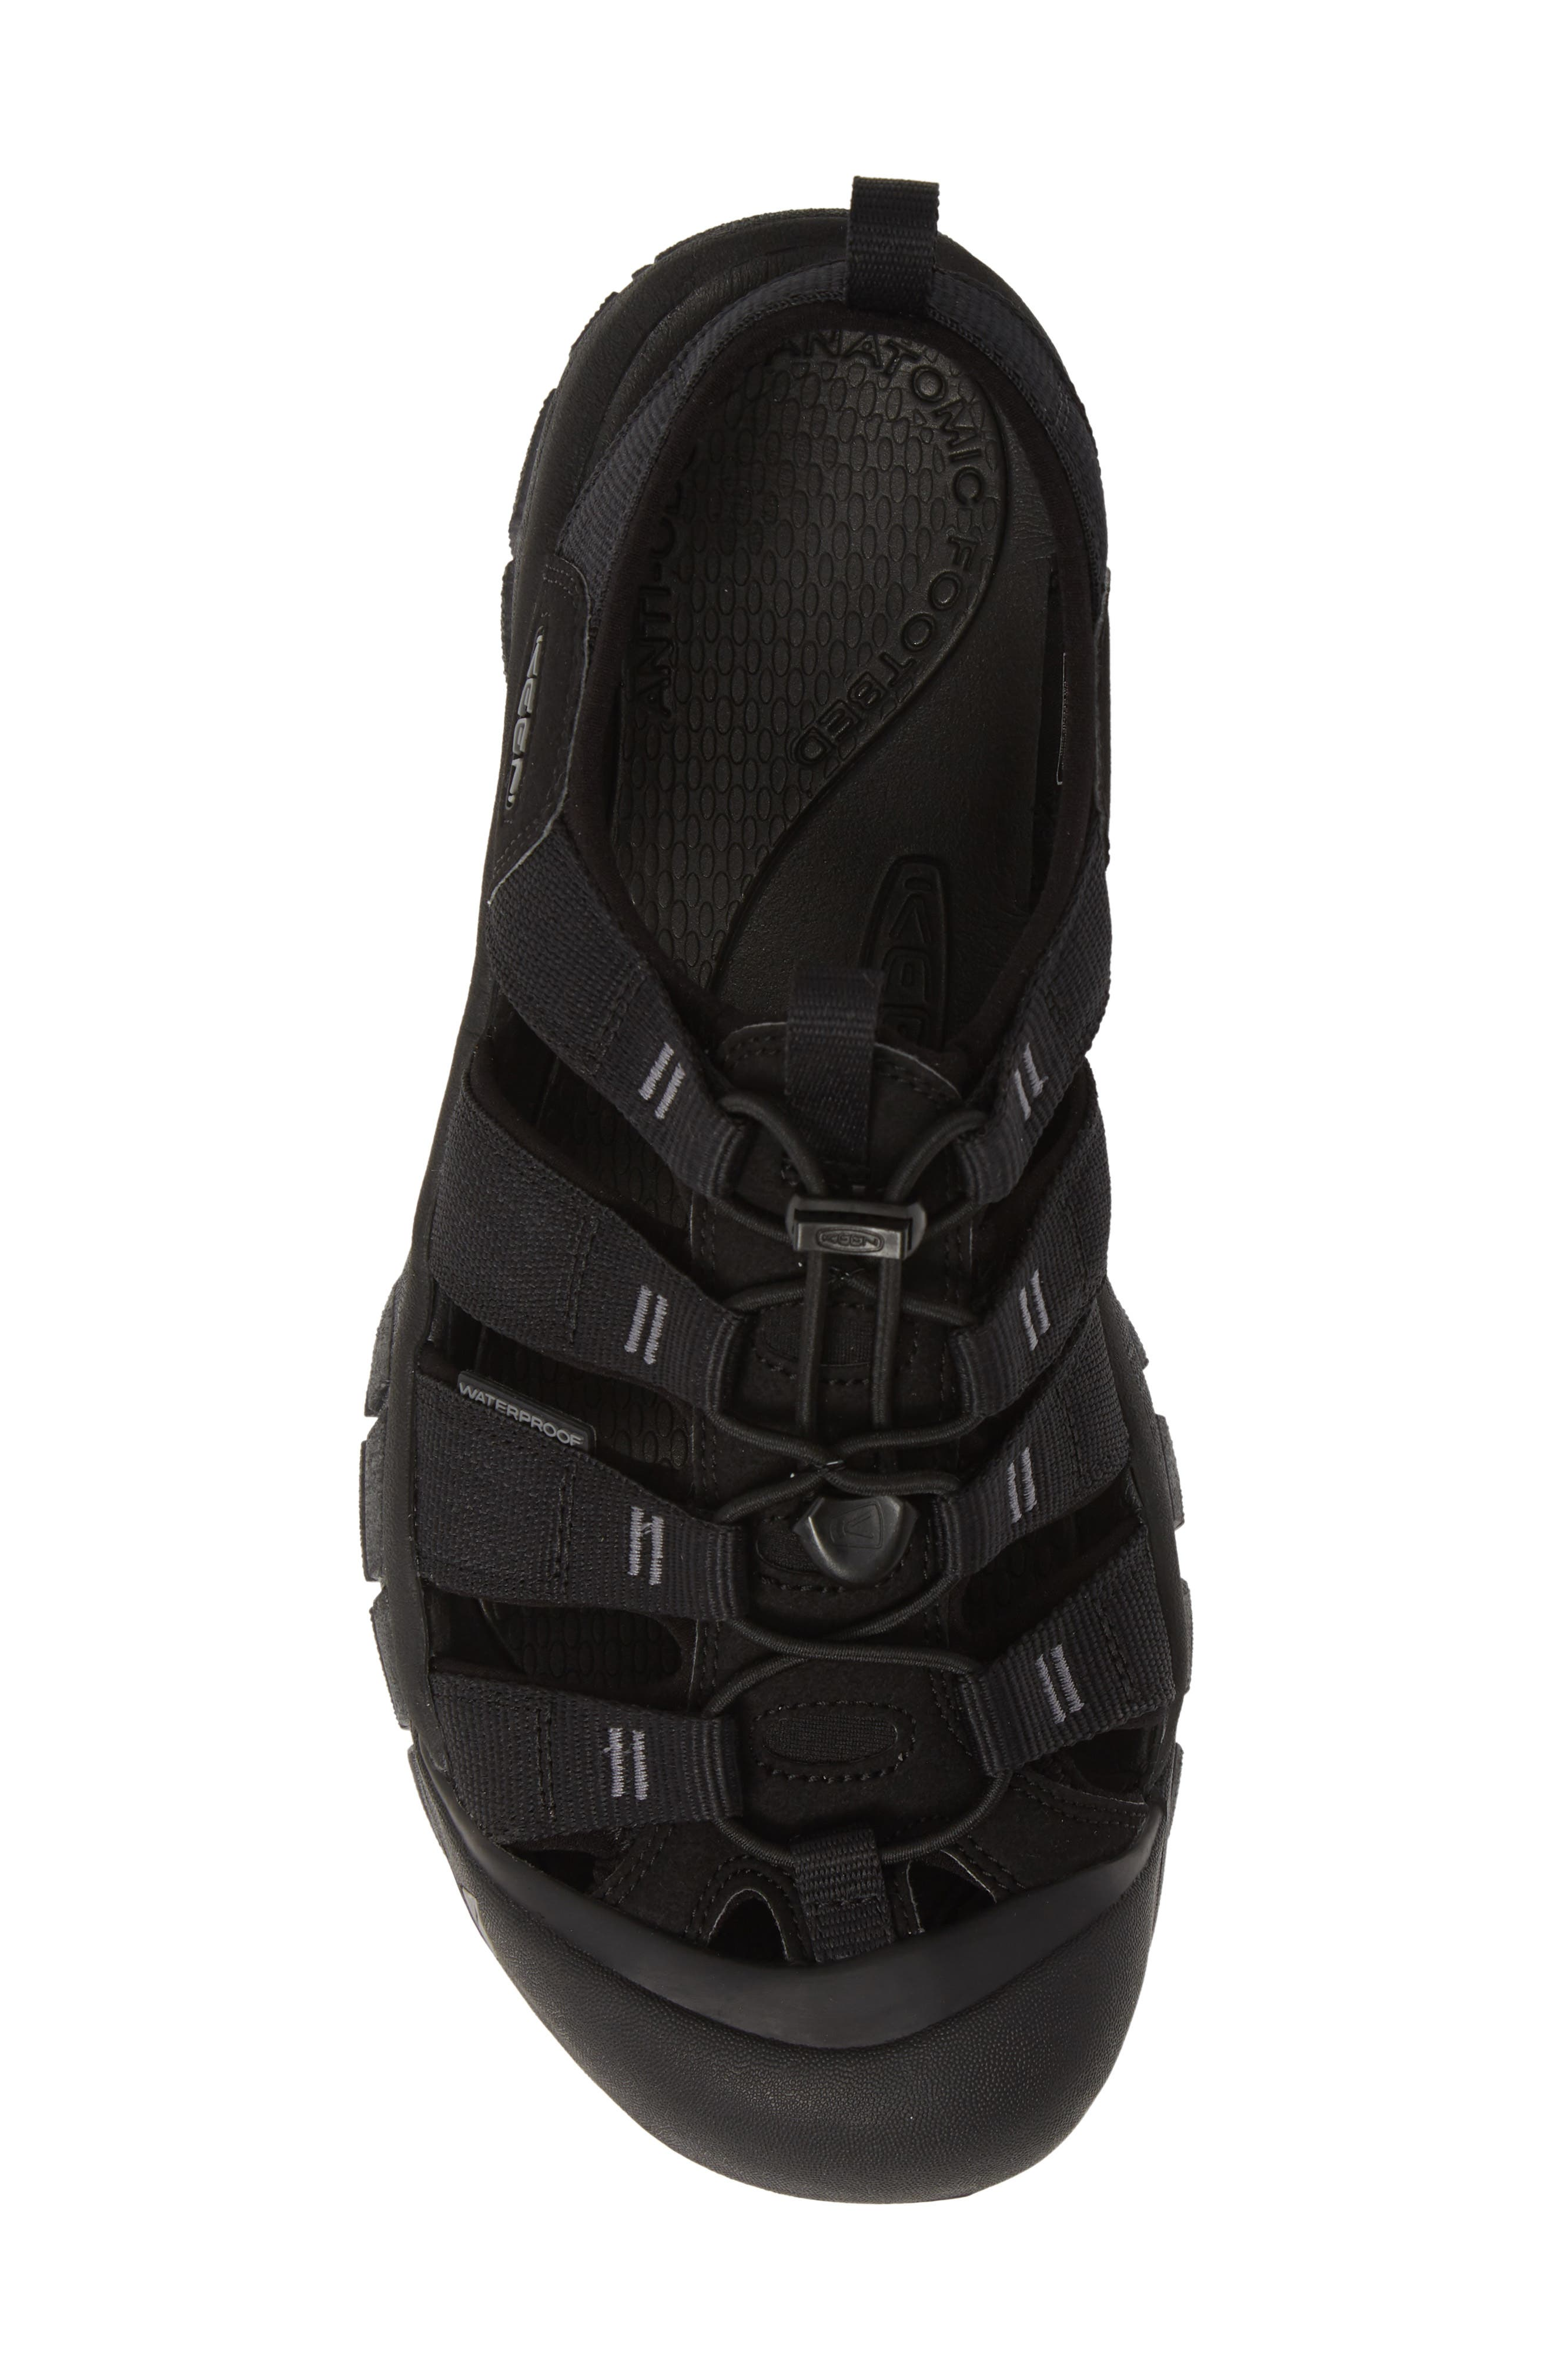 KEEN, 'Newport H2' Sandal, Alternate thumbnail 5, color, BLACK/ SWIRL OUTSOLE